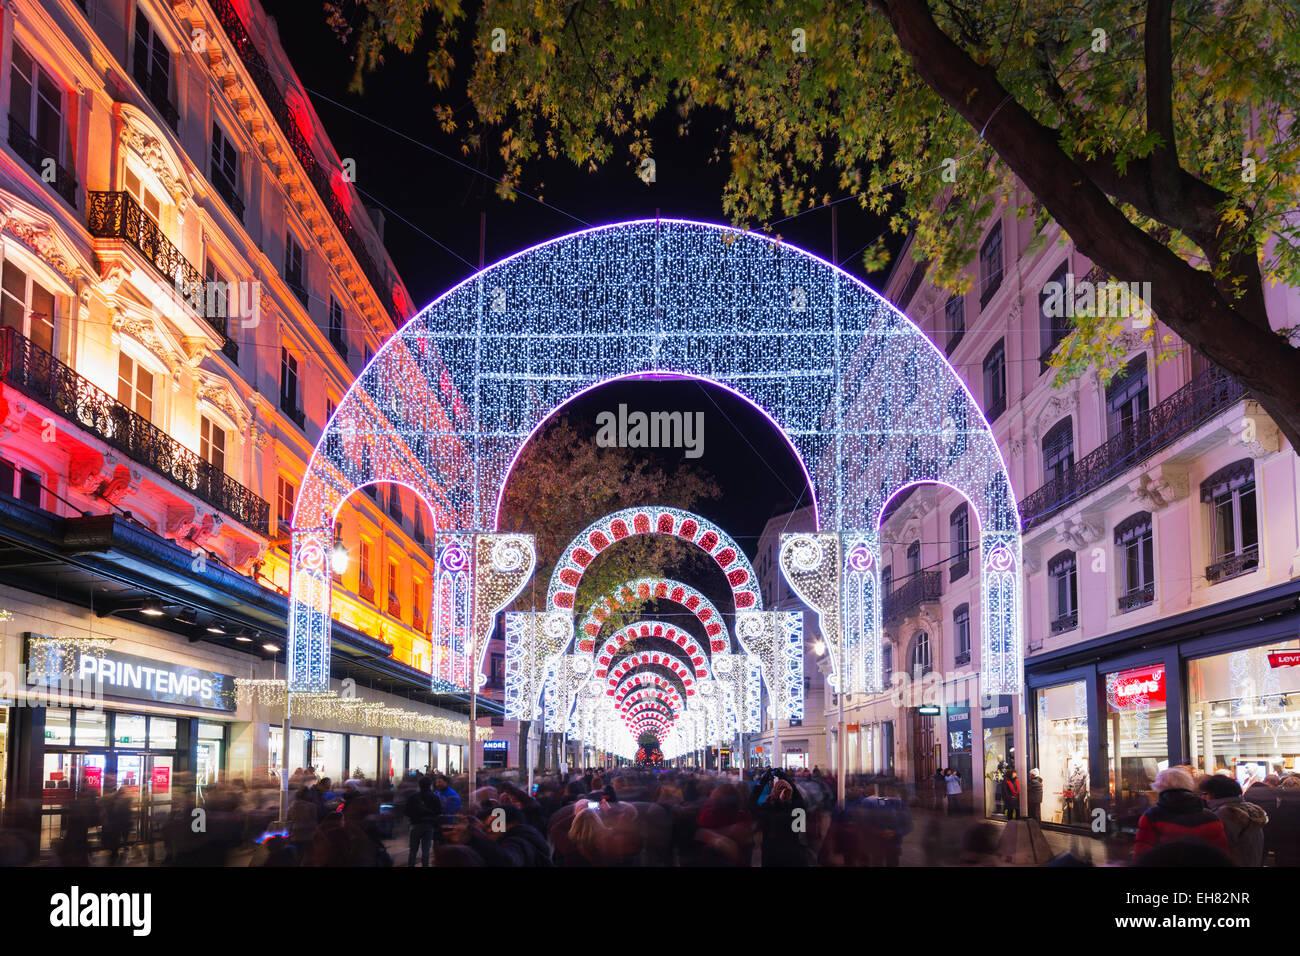 Fete des Lumieres (Festival of Lights), Lyon, Rhone-Alpes, France, Europe - Stock Image